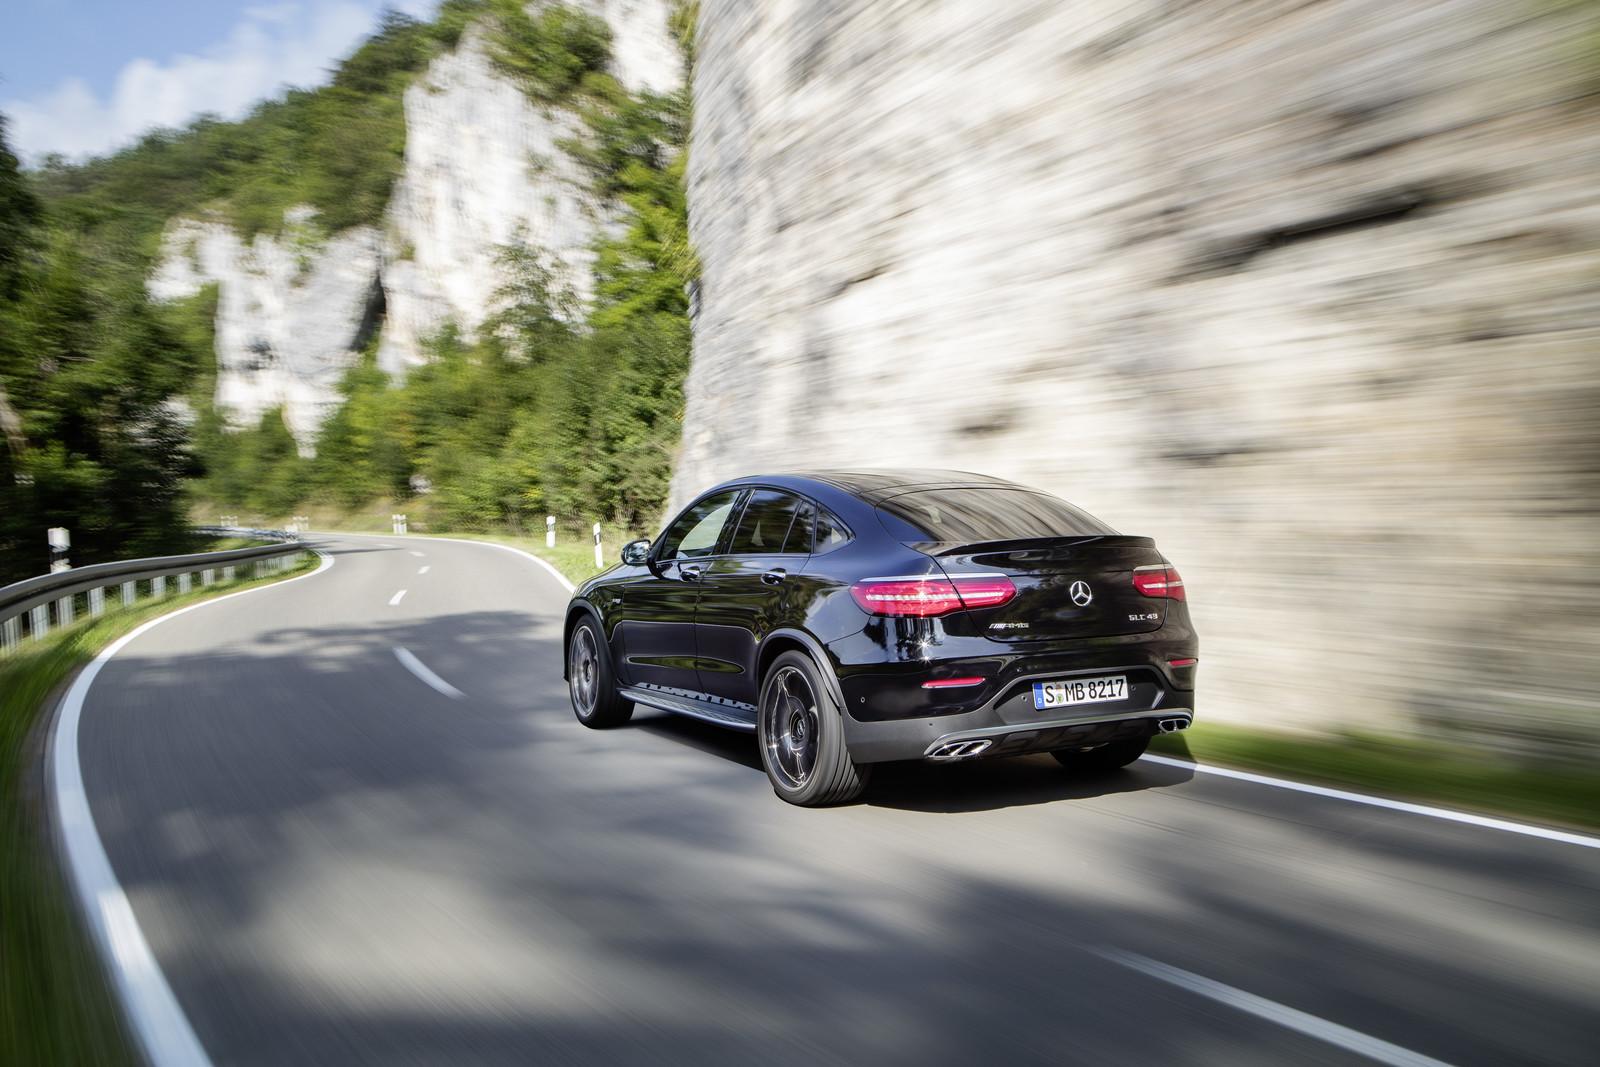 Foto de Mercedes-AMG GLC 43 4MATIC Coupé (6/24)